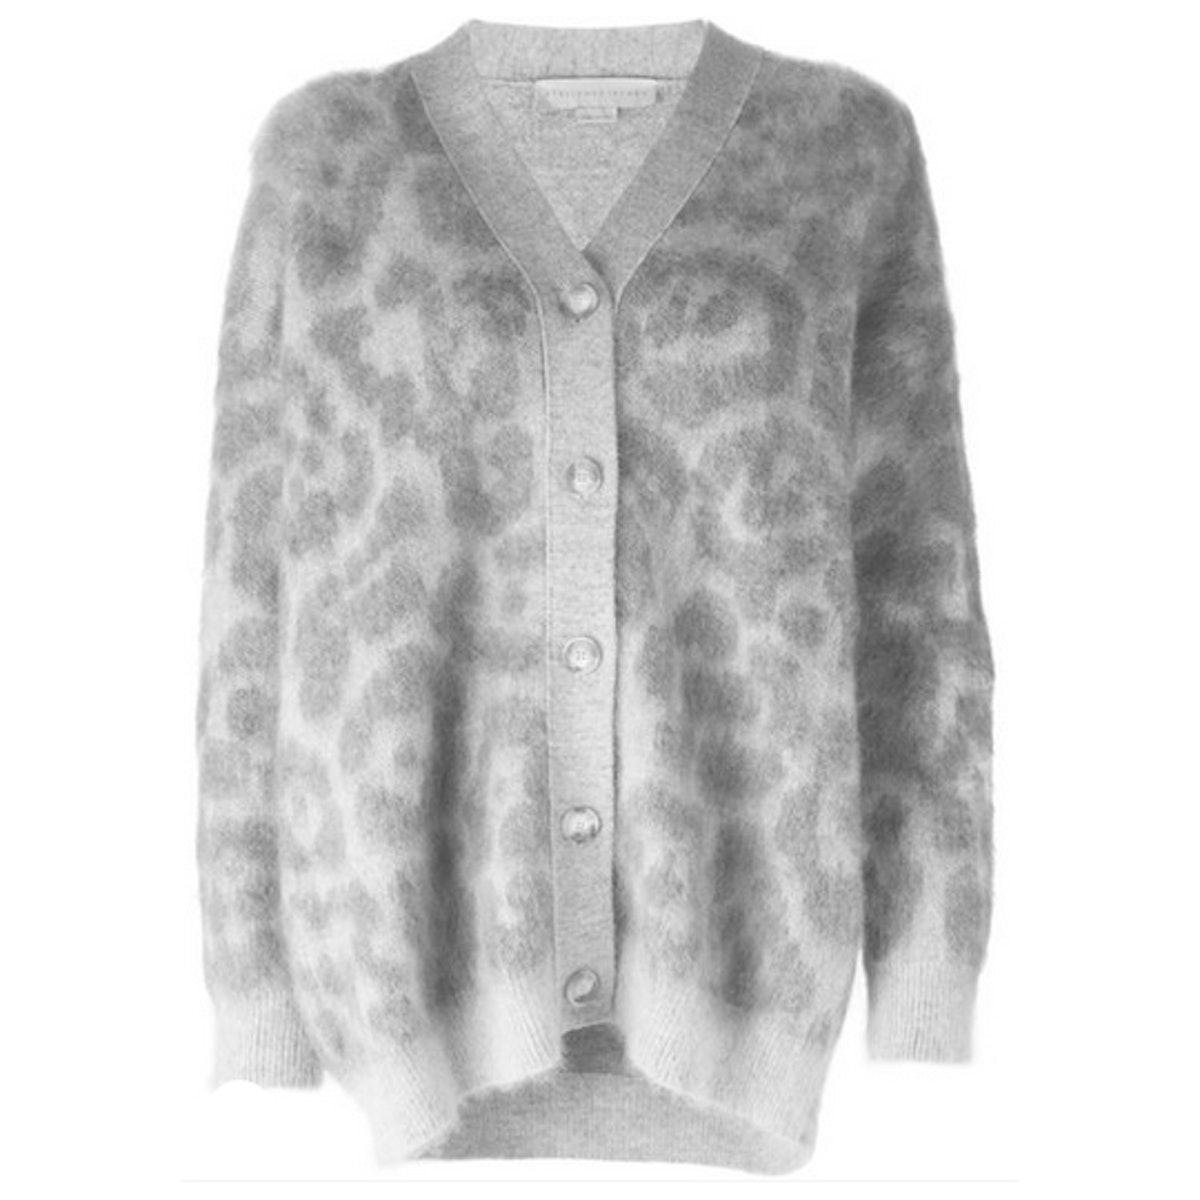 Stella McCartney leopard cardigan